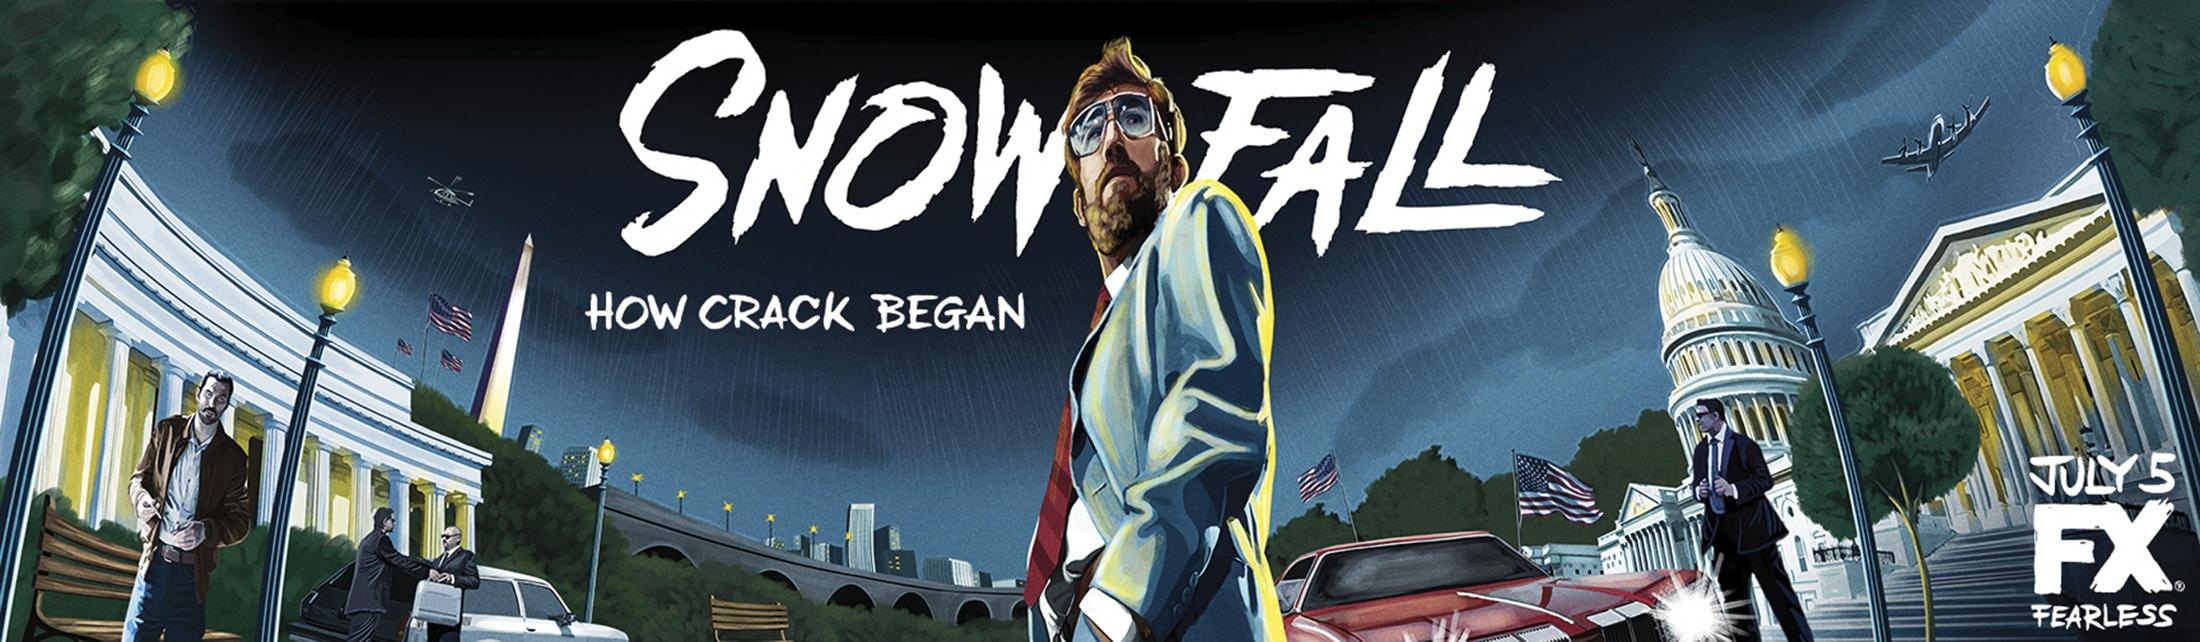 Thumbnail for Snowfall billboard (Teddy)